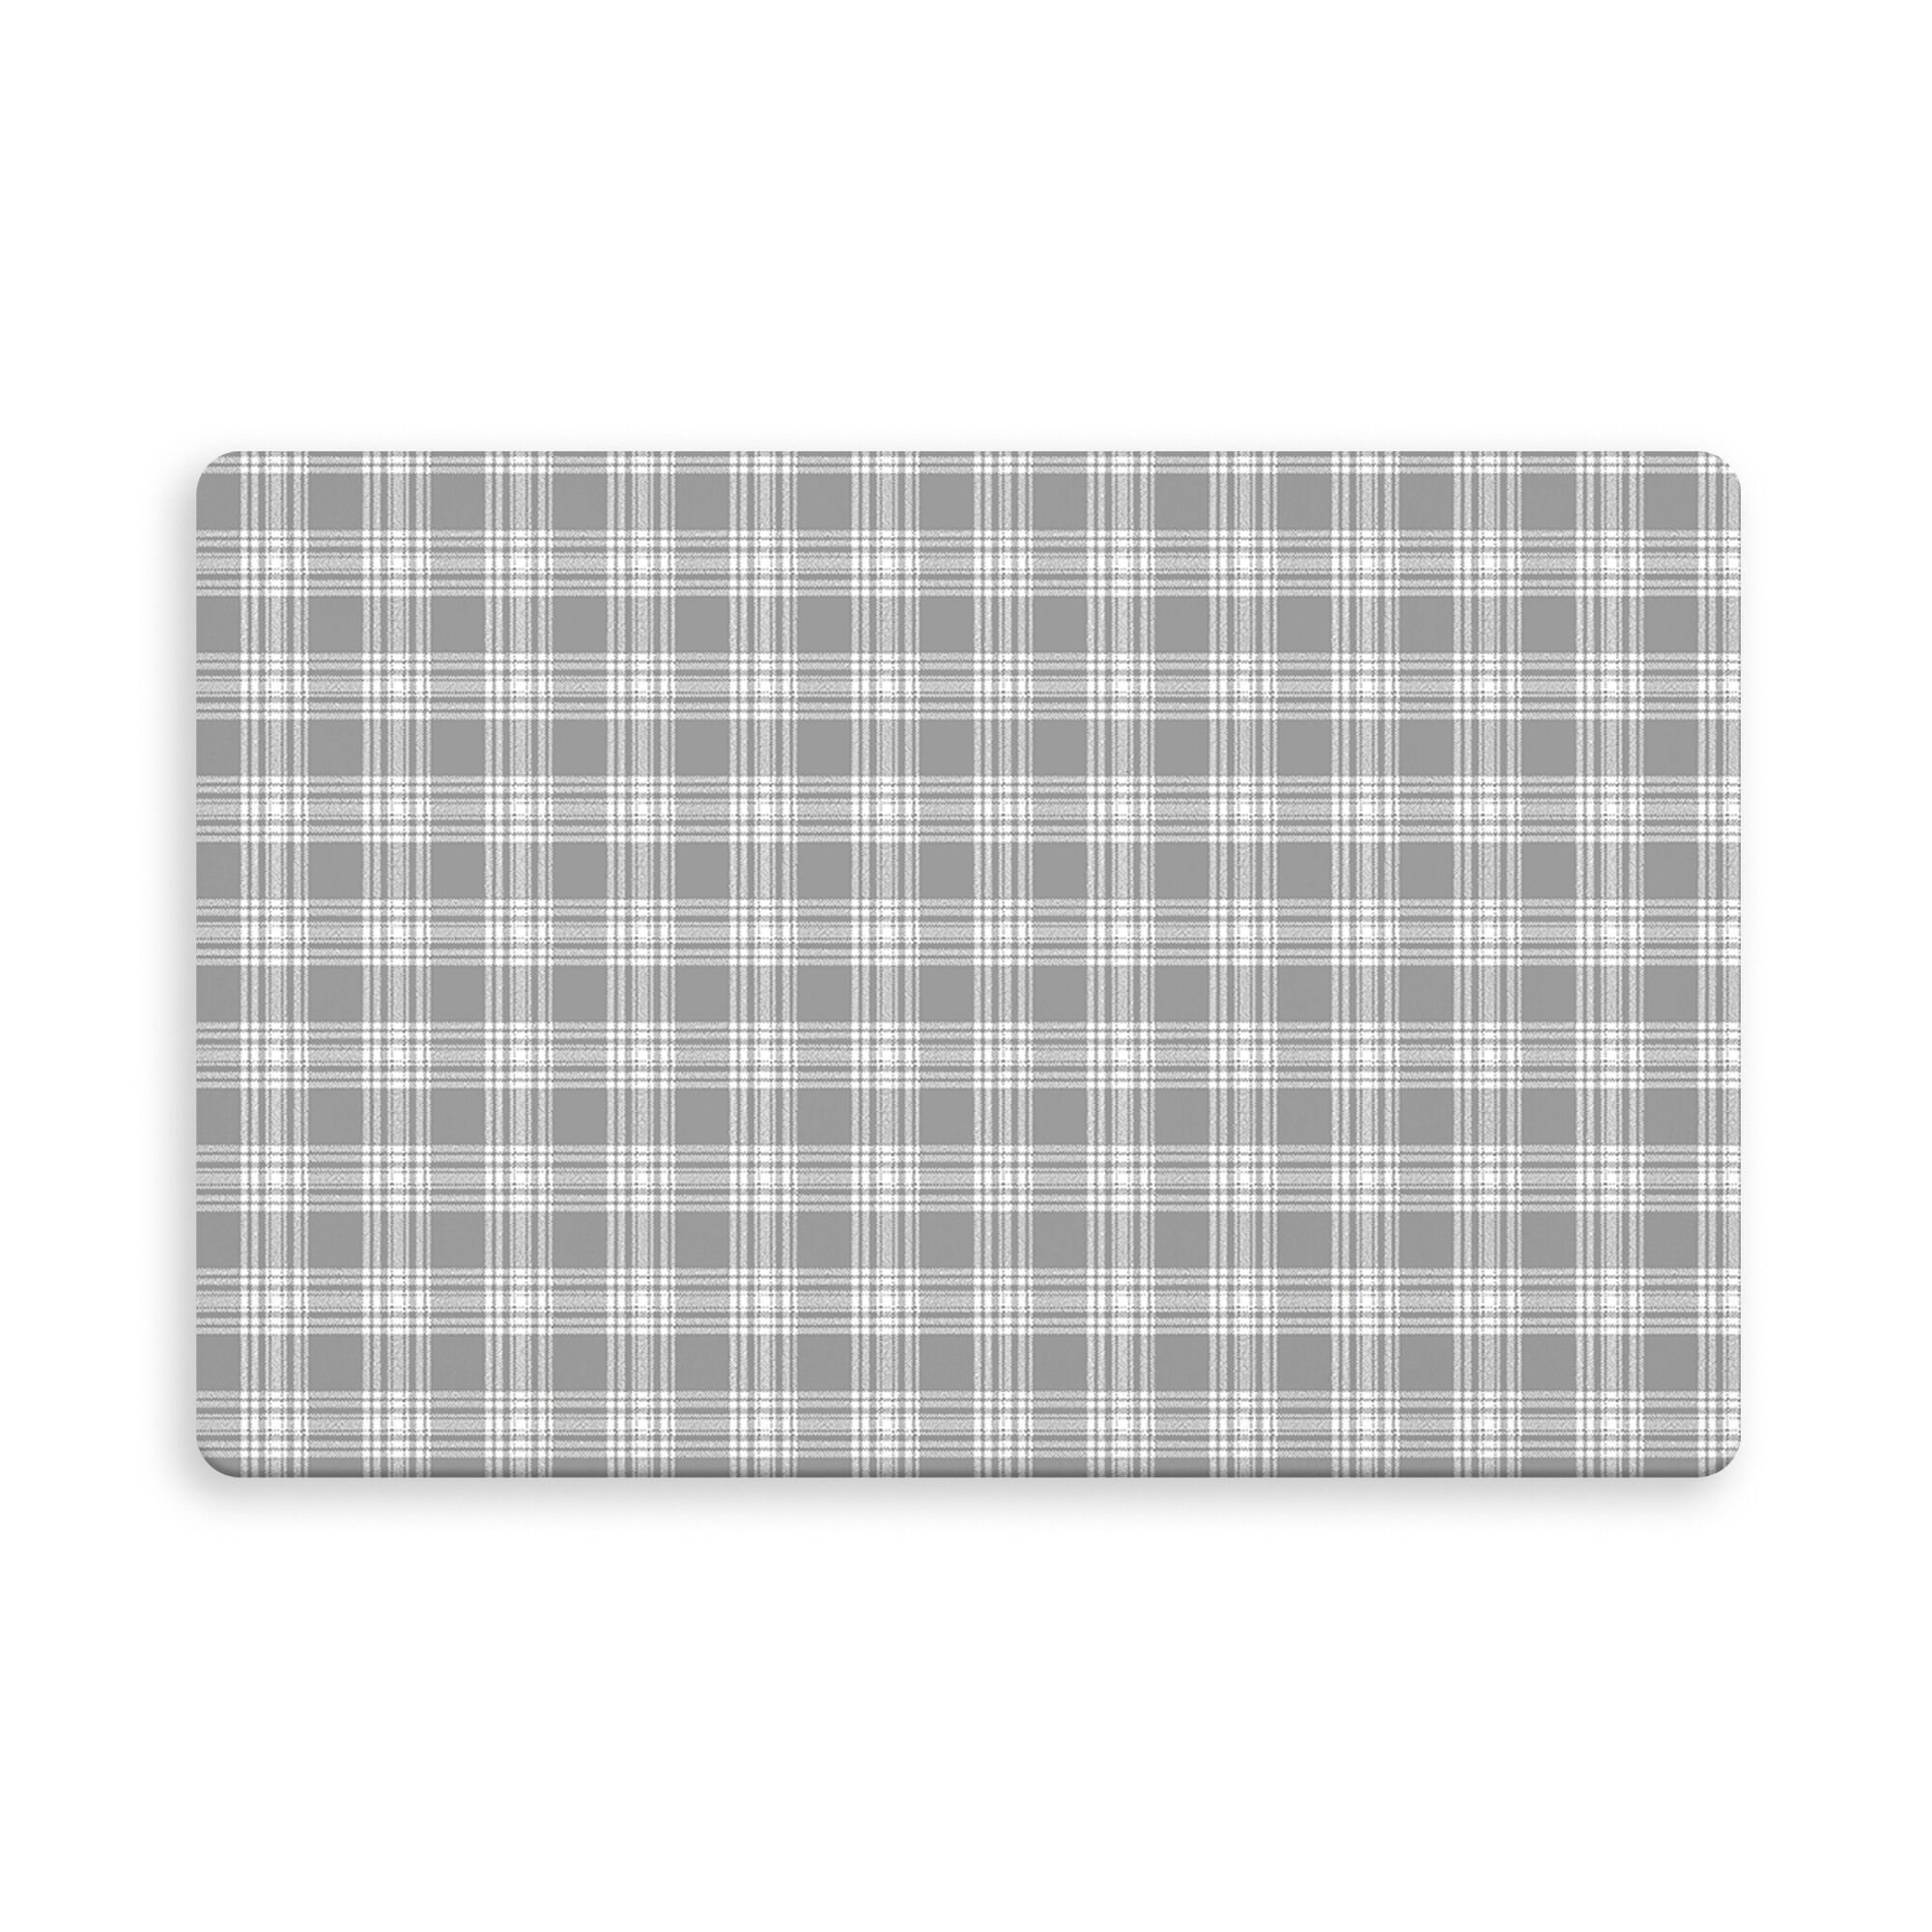 Wooten Plaid Doormat Color: Dark Gray, Mat Size: Rectangle 2'6